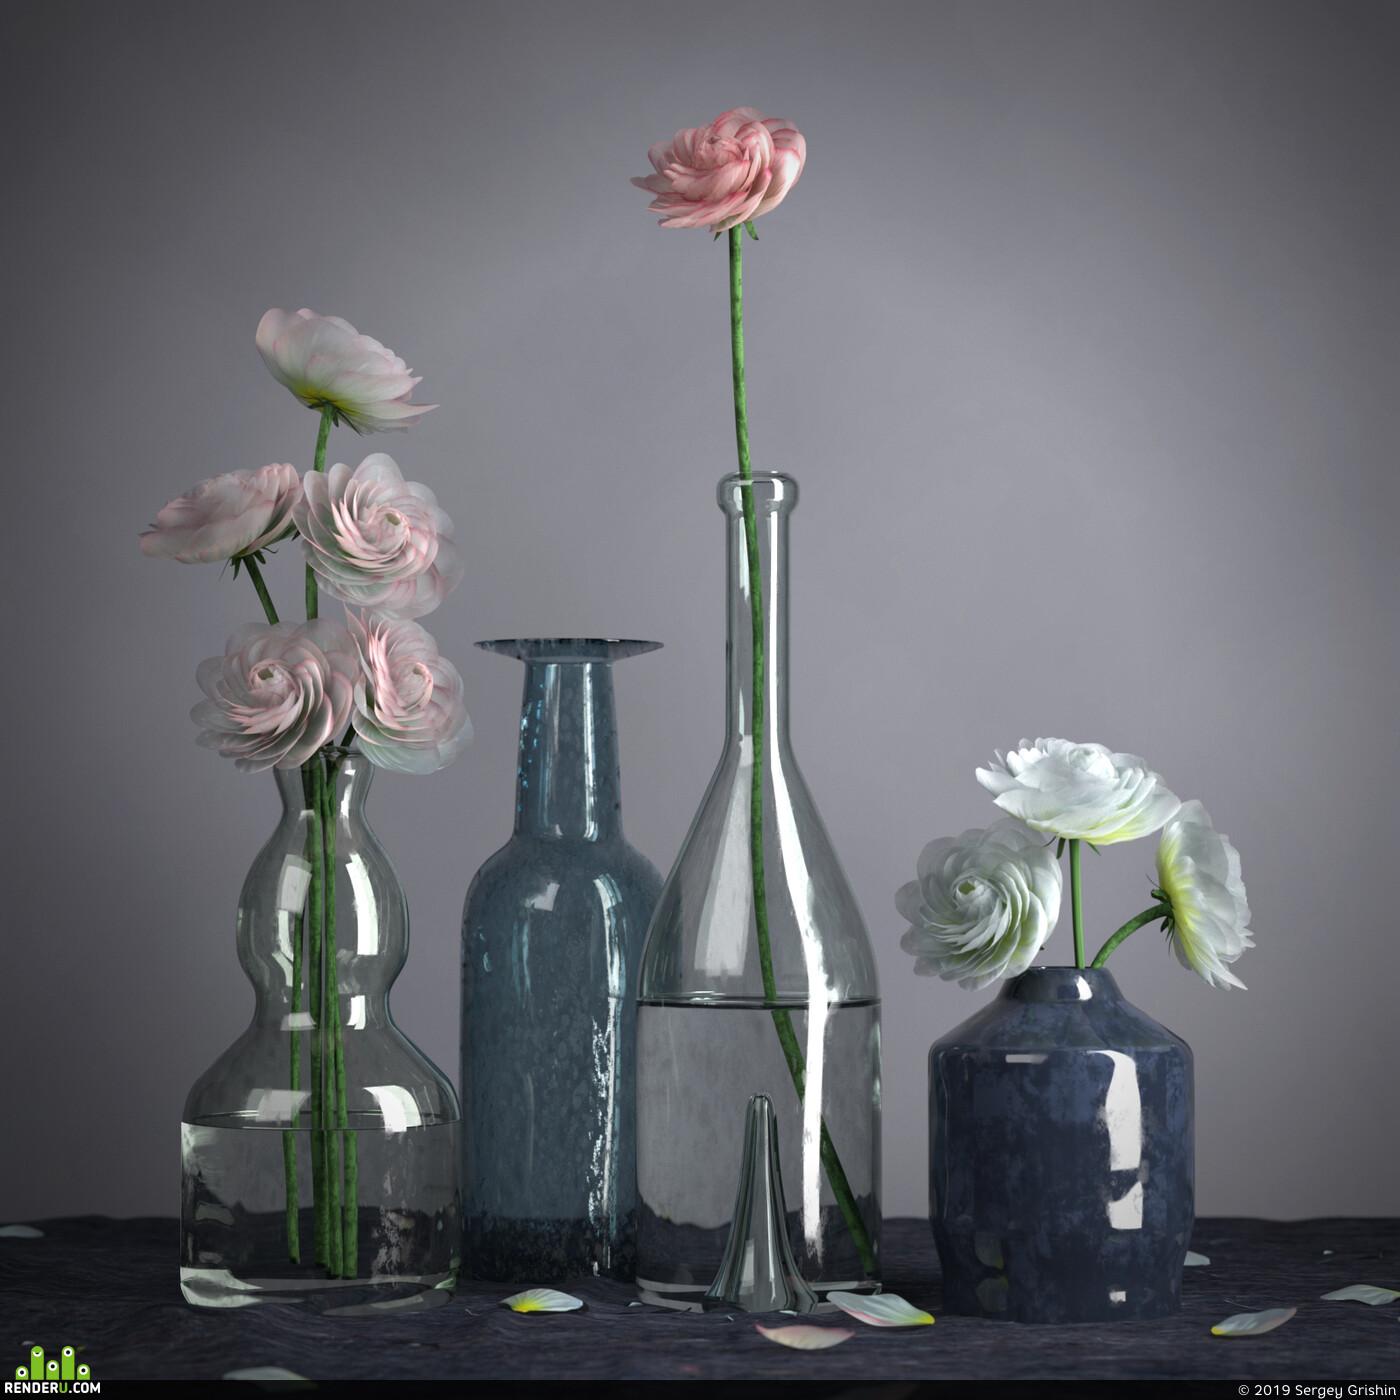 Натюрморт, ваза, стекло, цветы, букет, бутылка, лепесток, лепестки